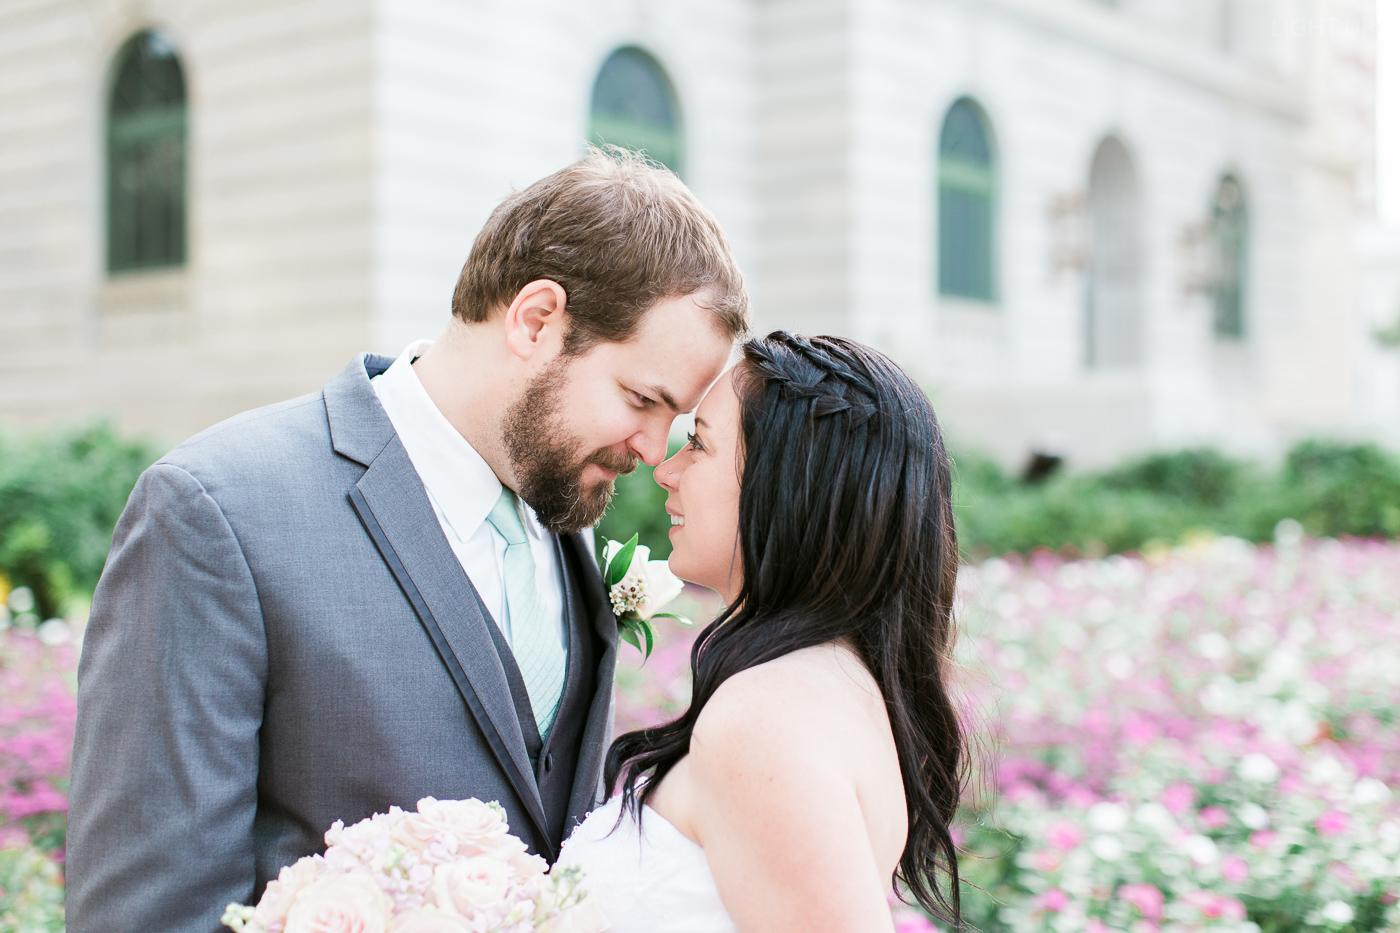 downtown-orlando-wedding-photographer-66.jpg